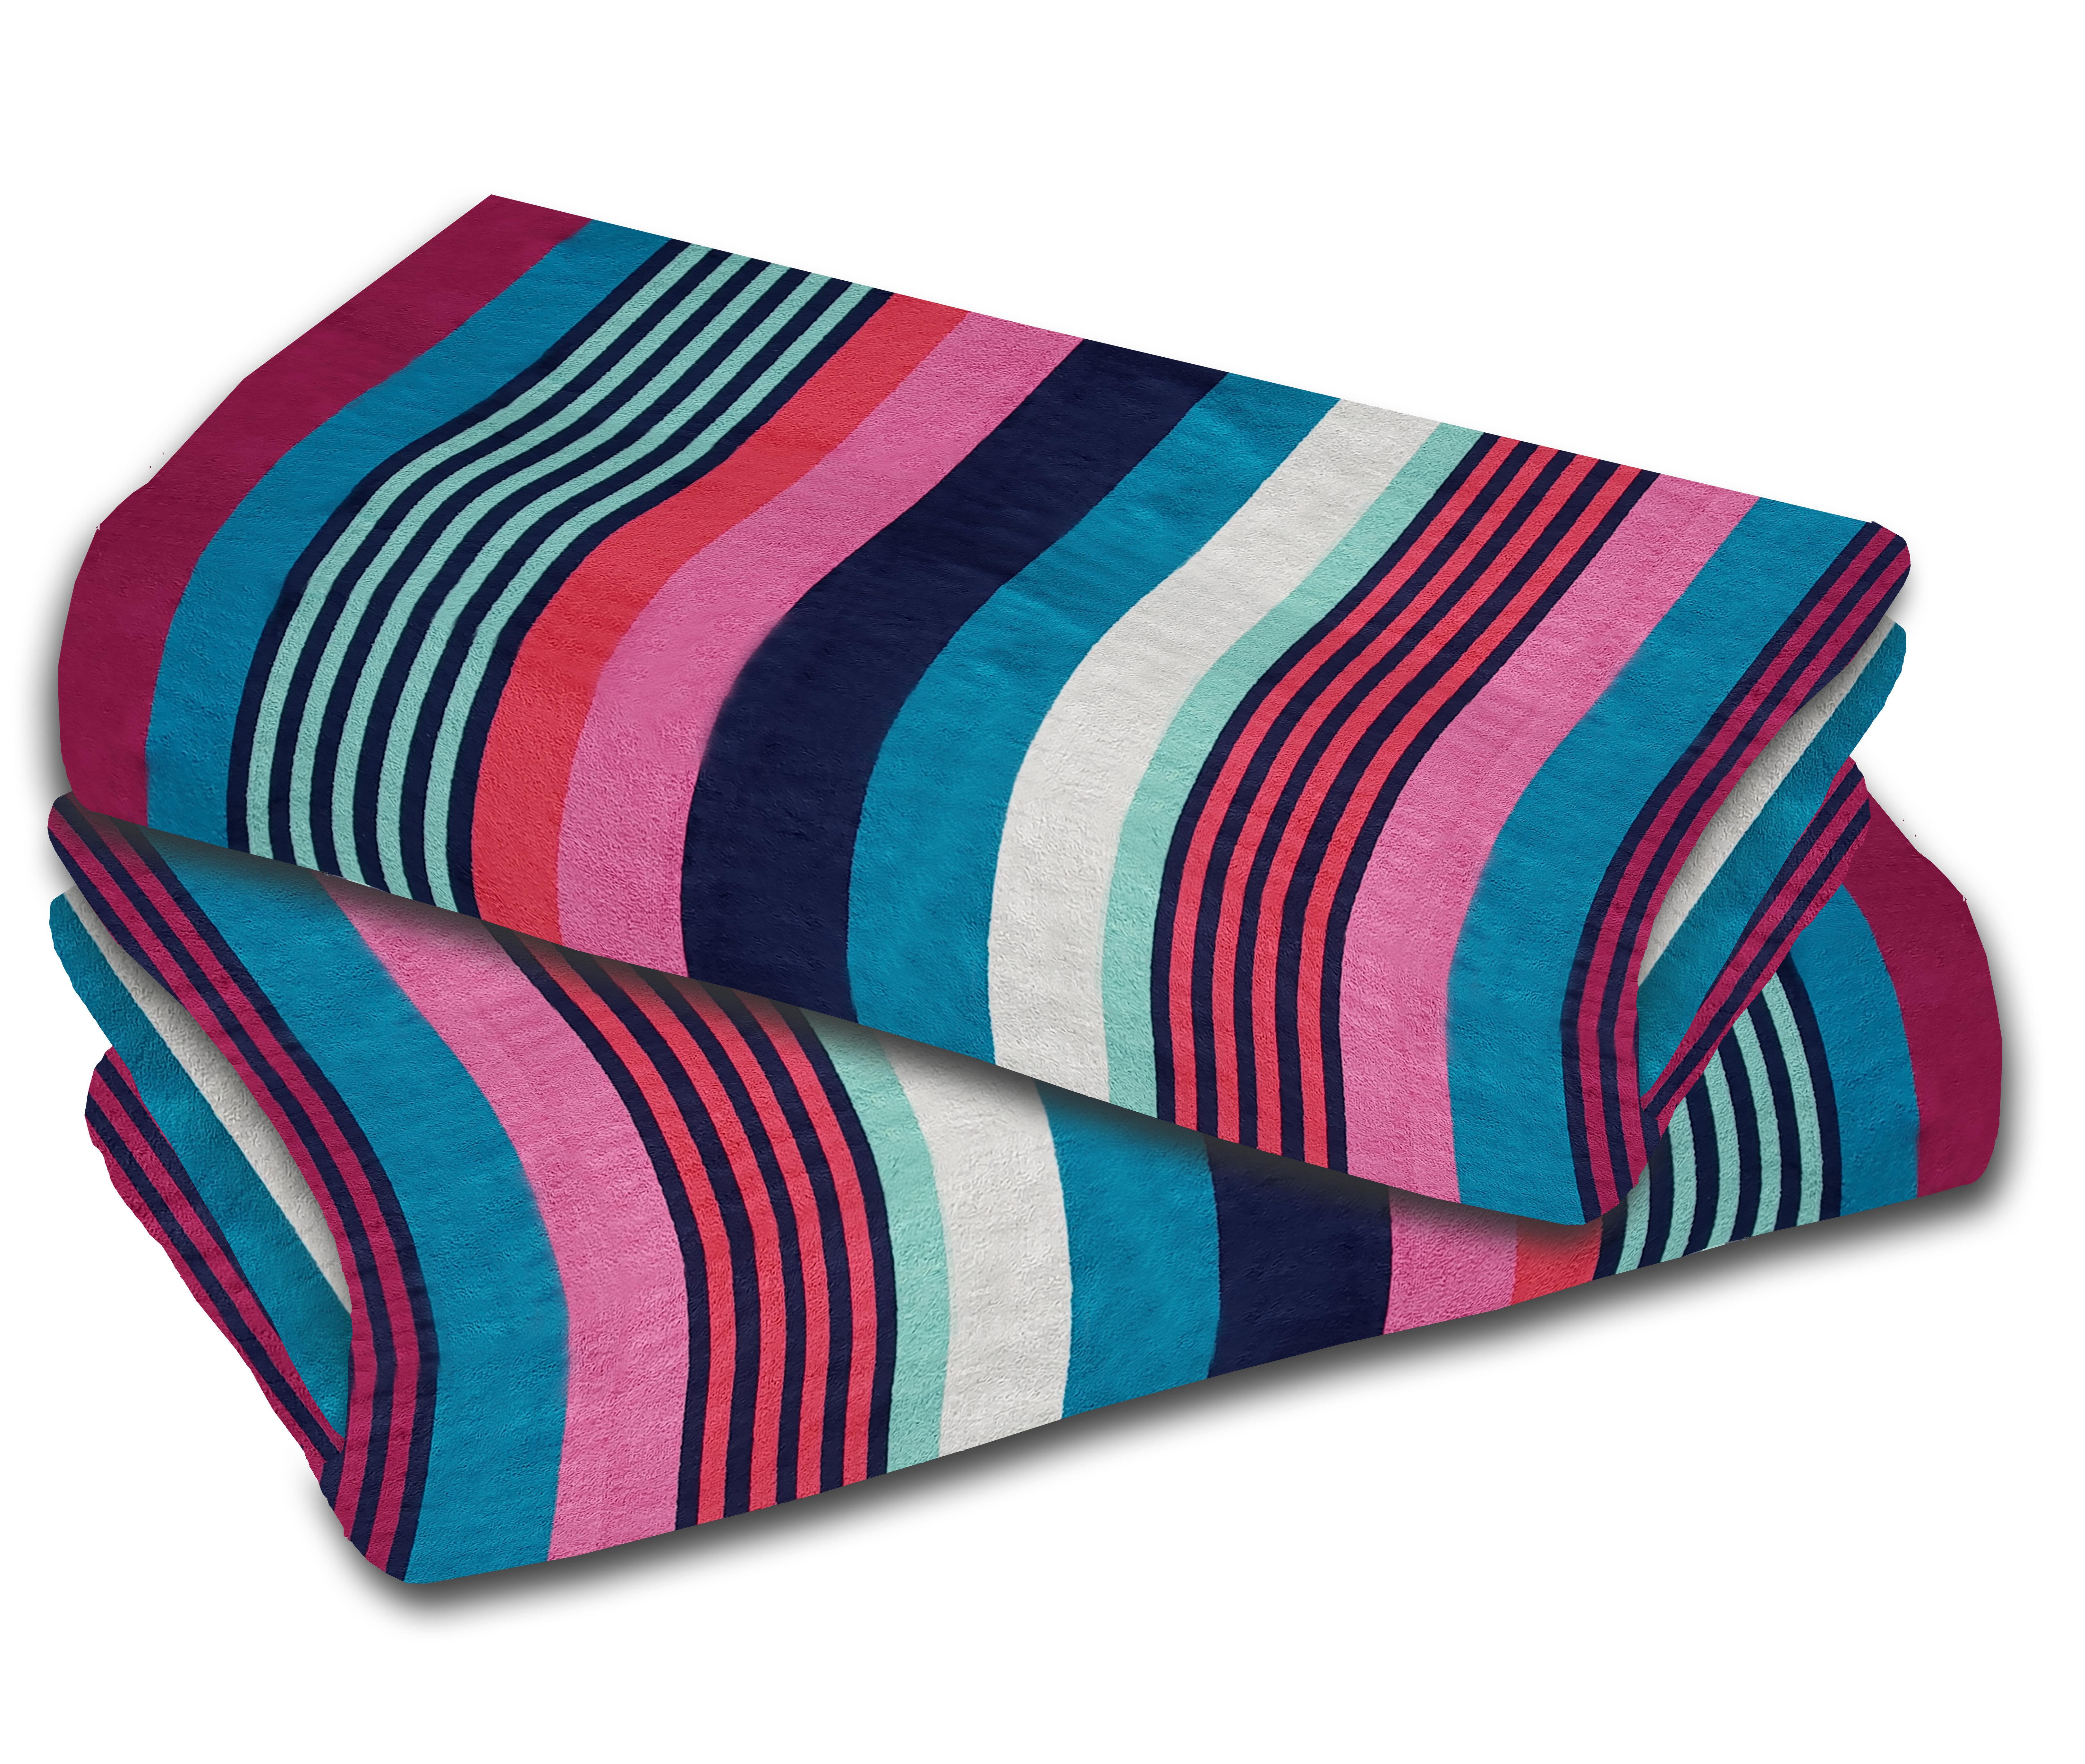 Kay Sam Microfiber Quick Drying Beach Towel Li-lo /& Sti-tch Beach Towel Sheet Bath Set Bathroom Bath Towels Accessories Pool Towel